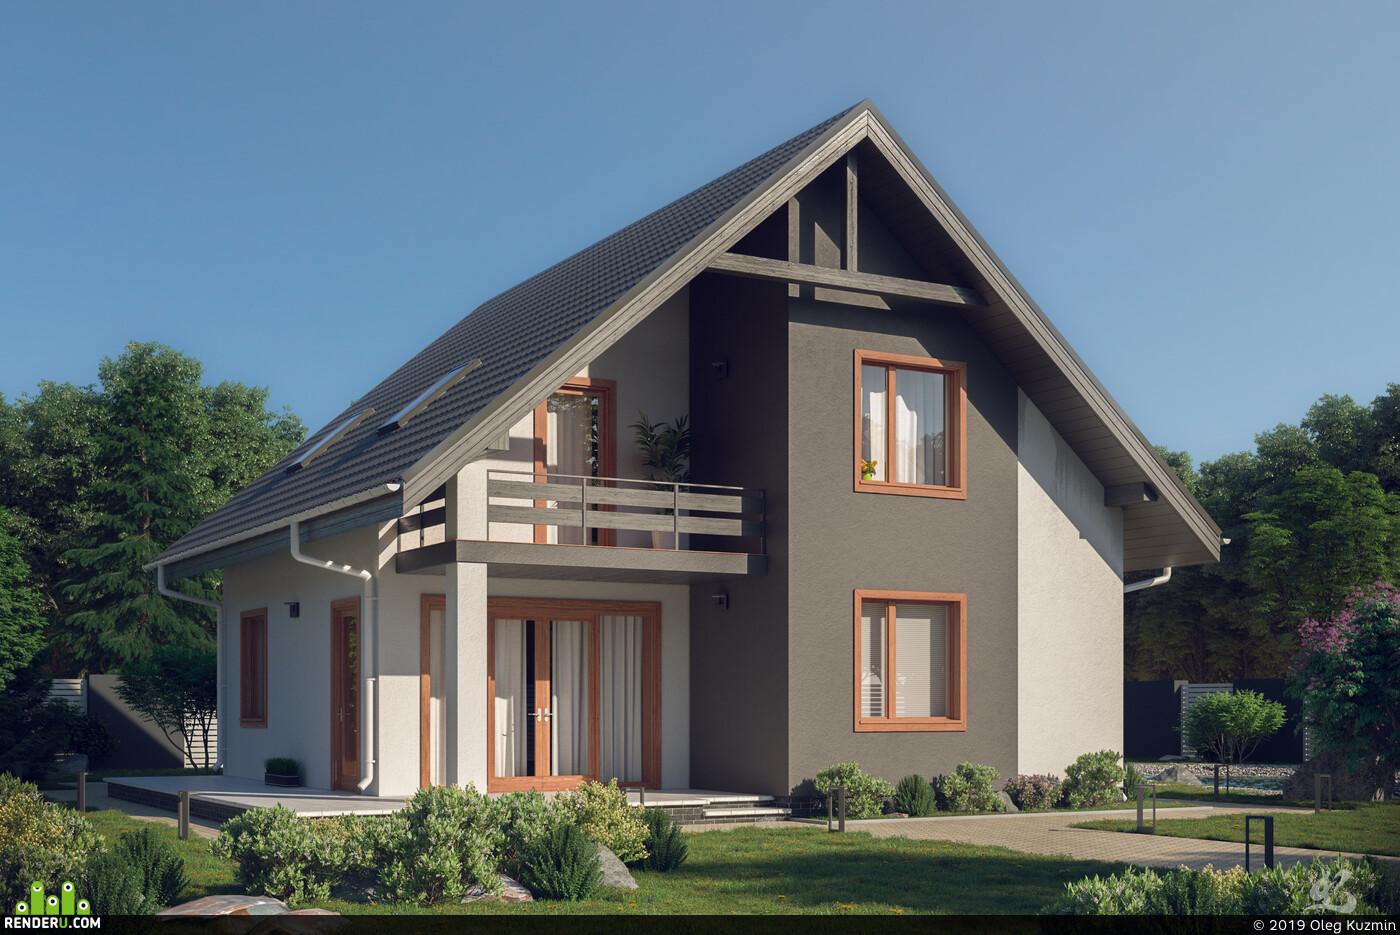 Exterior, archviz, architecture, architectural render, v-ray, 3ds max